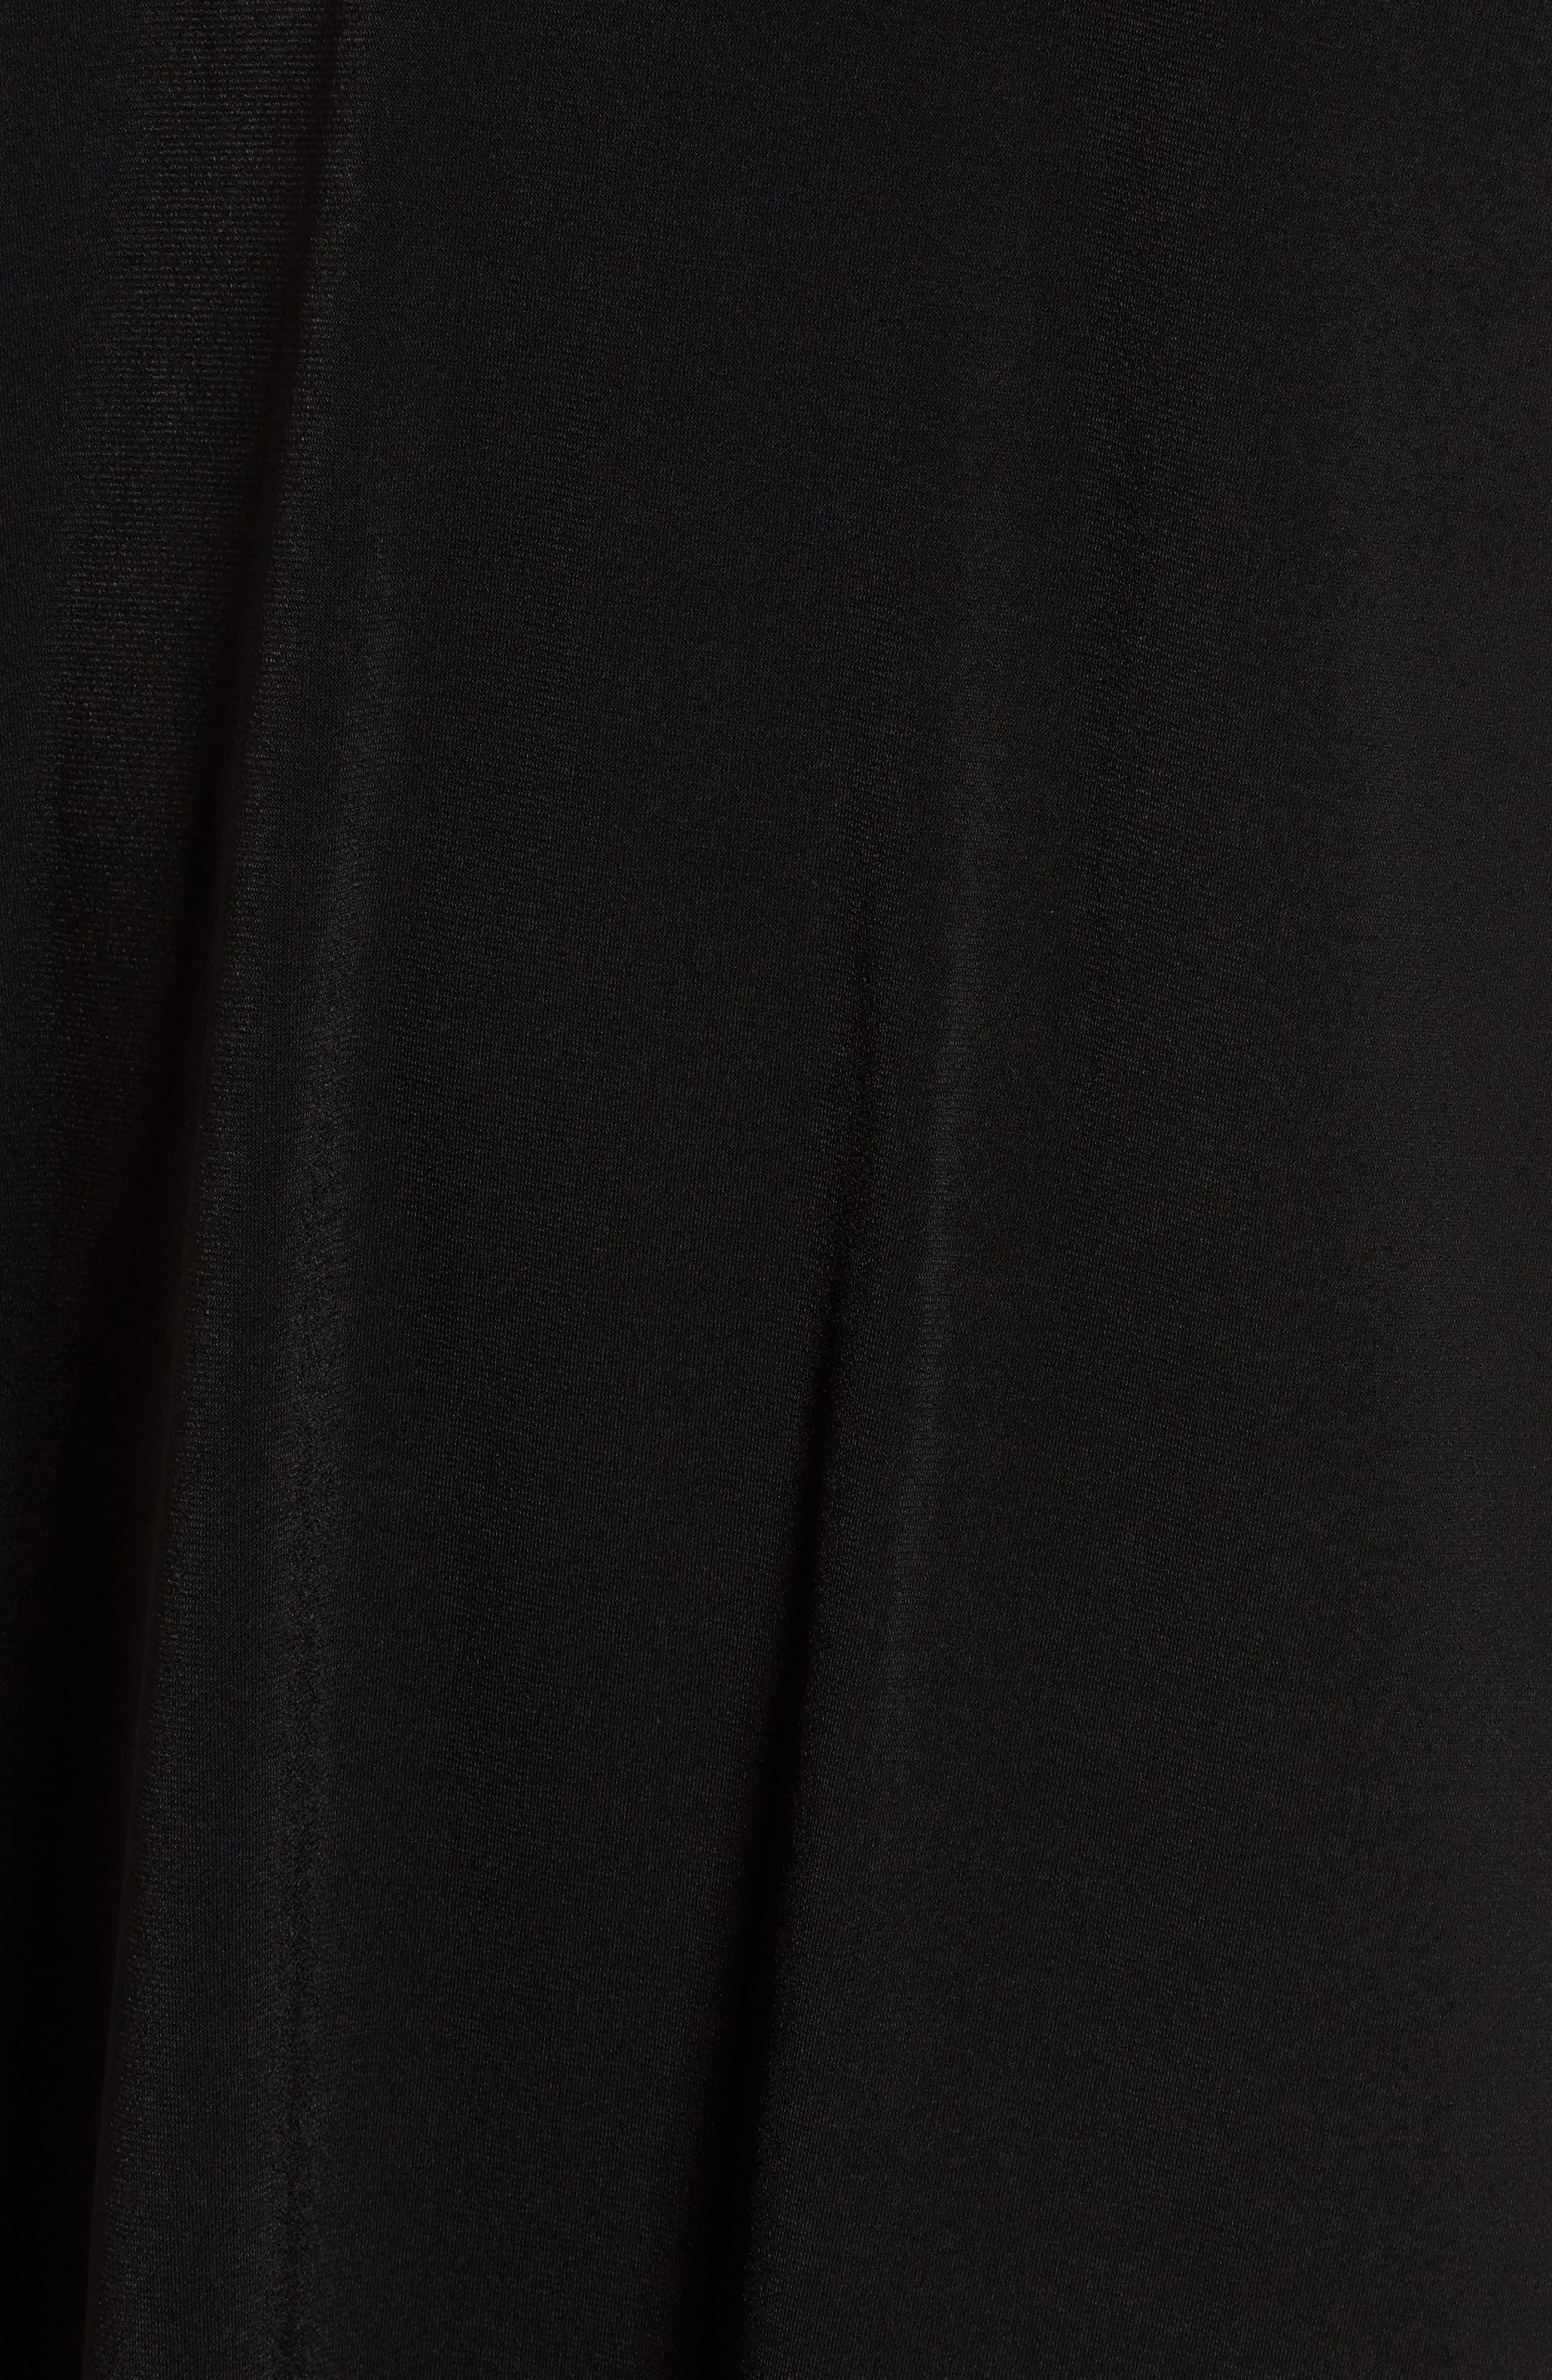 V-Neck A-Line Dress,                             Alternate thumbnail 13, color,